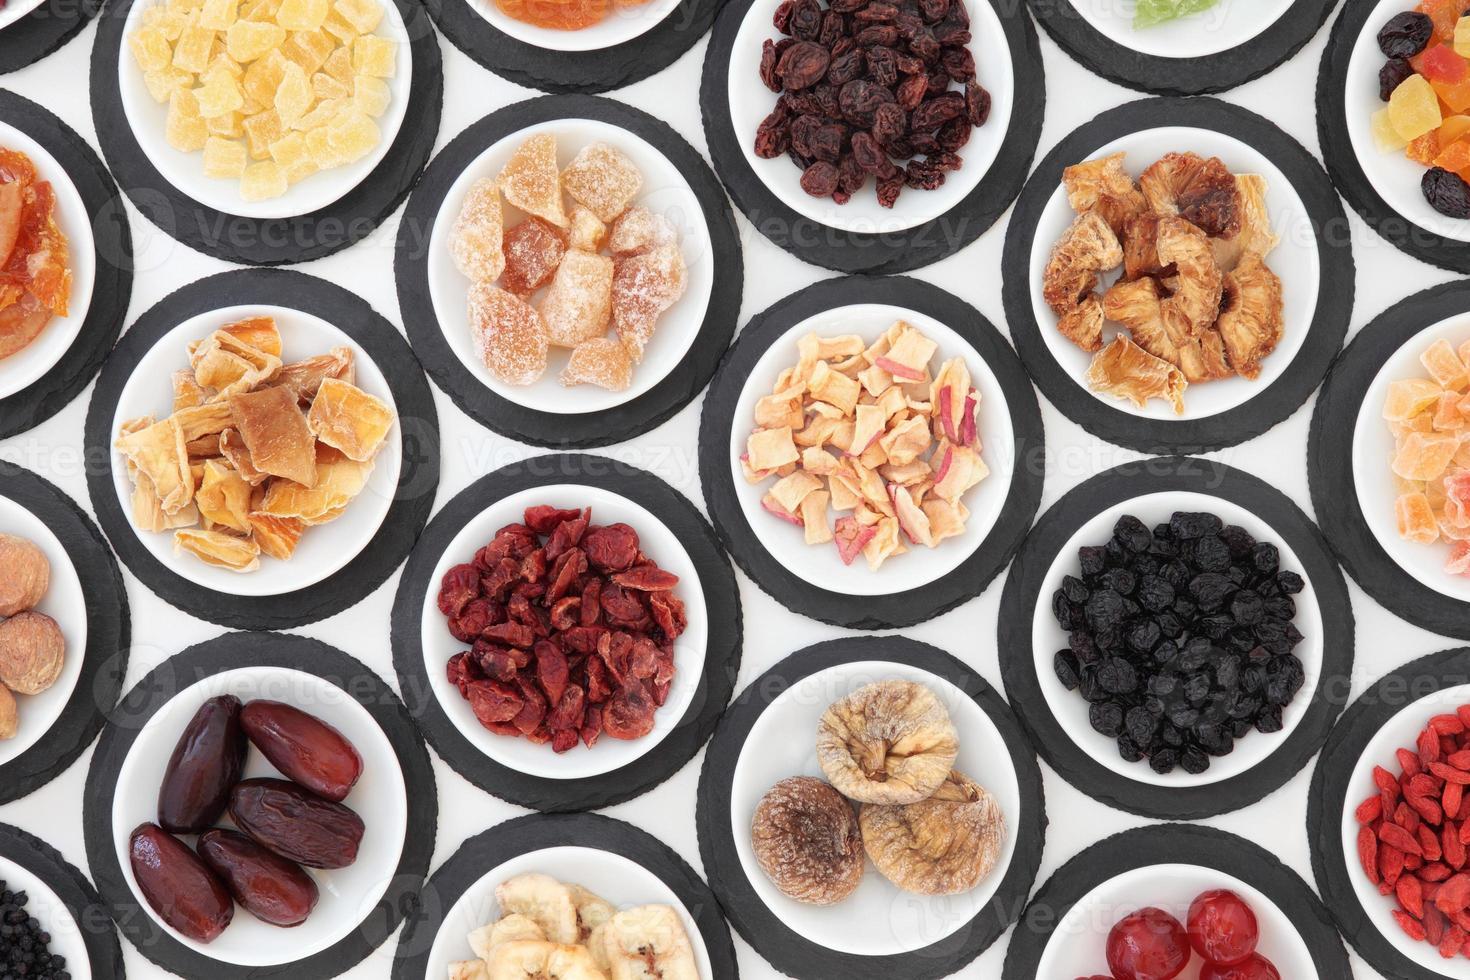 selezione di frutta secca foto